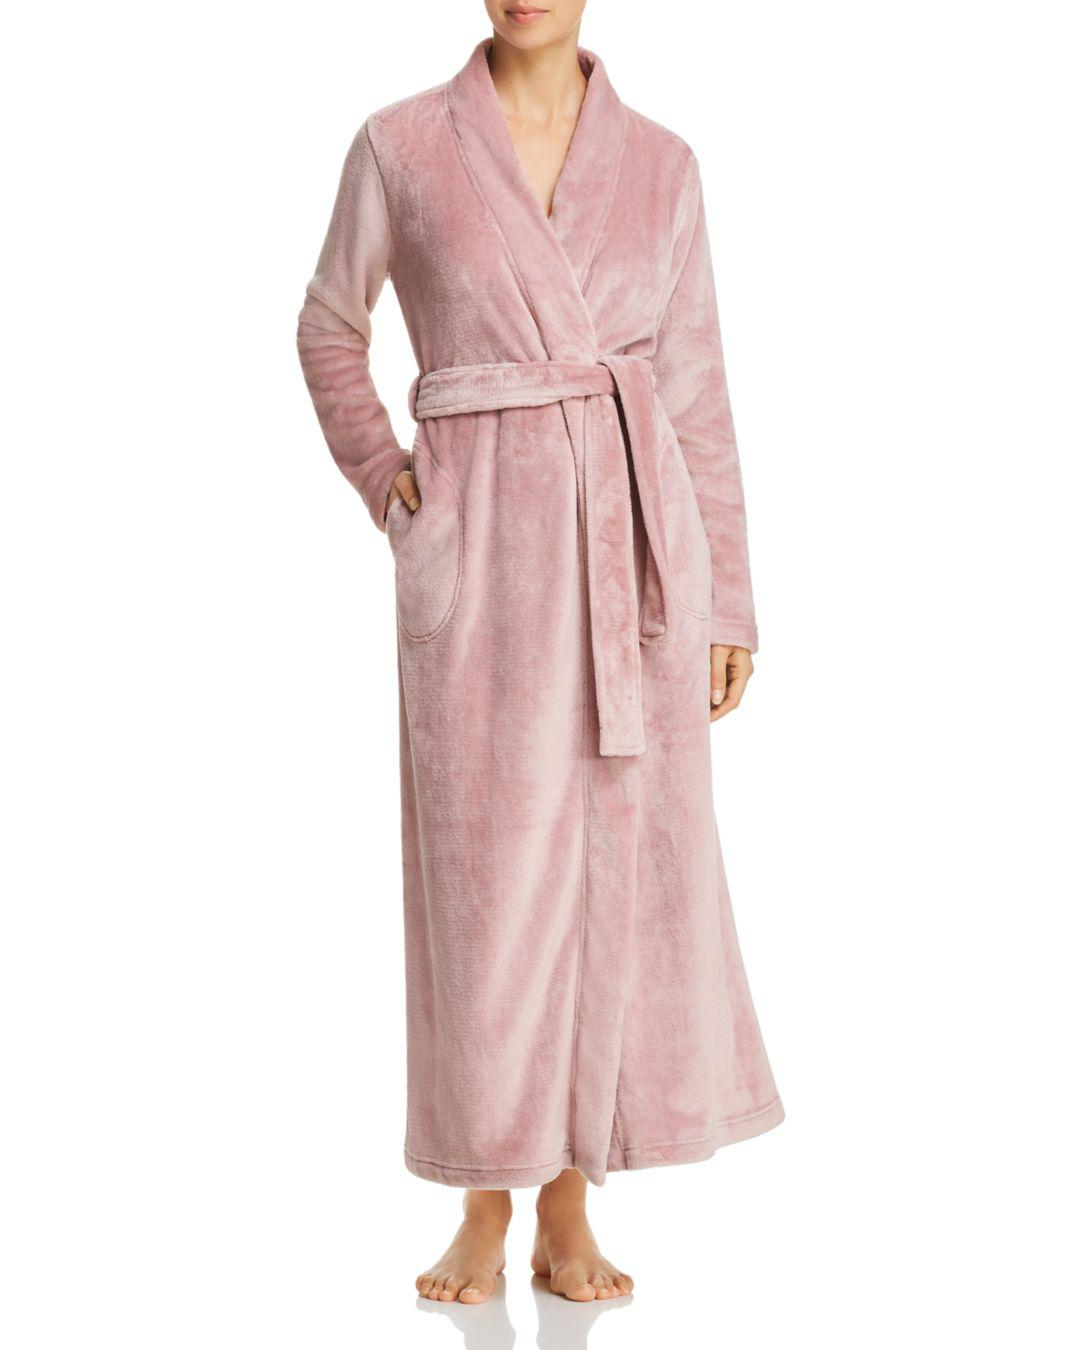 Lyst - UGG Marlow Plush Long Robe in Pink dbdae45af